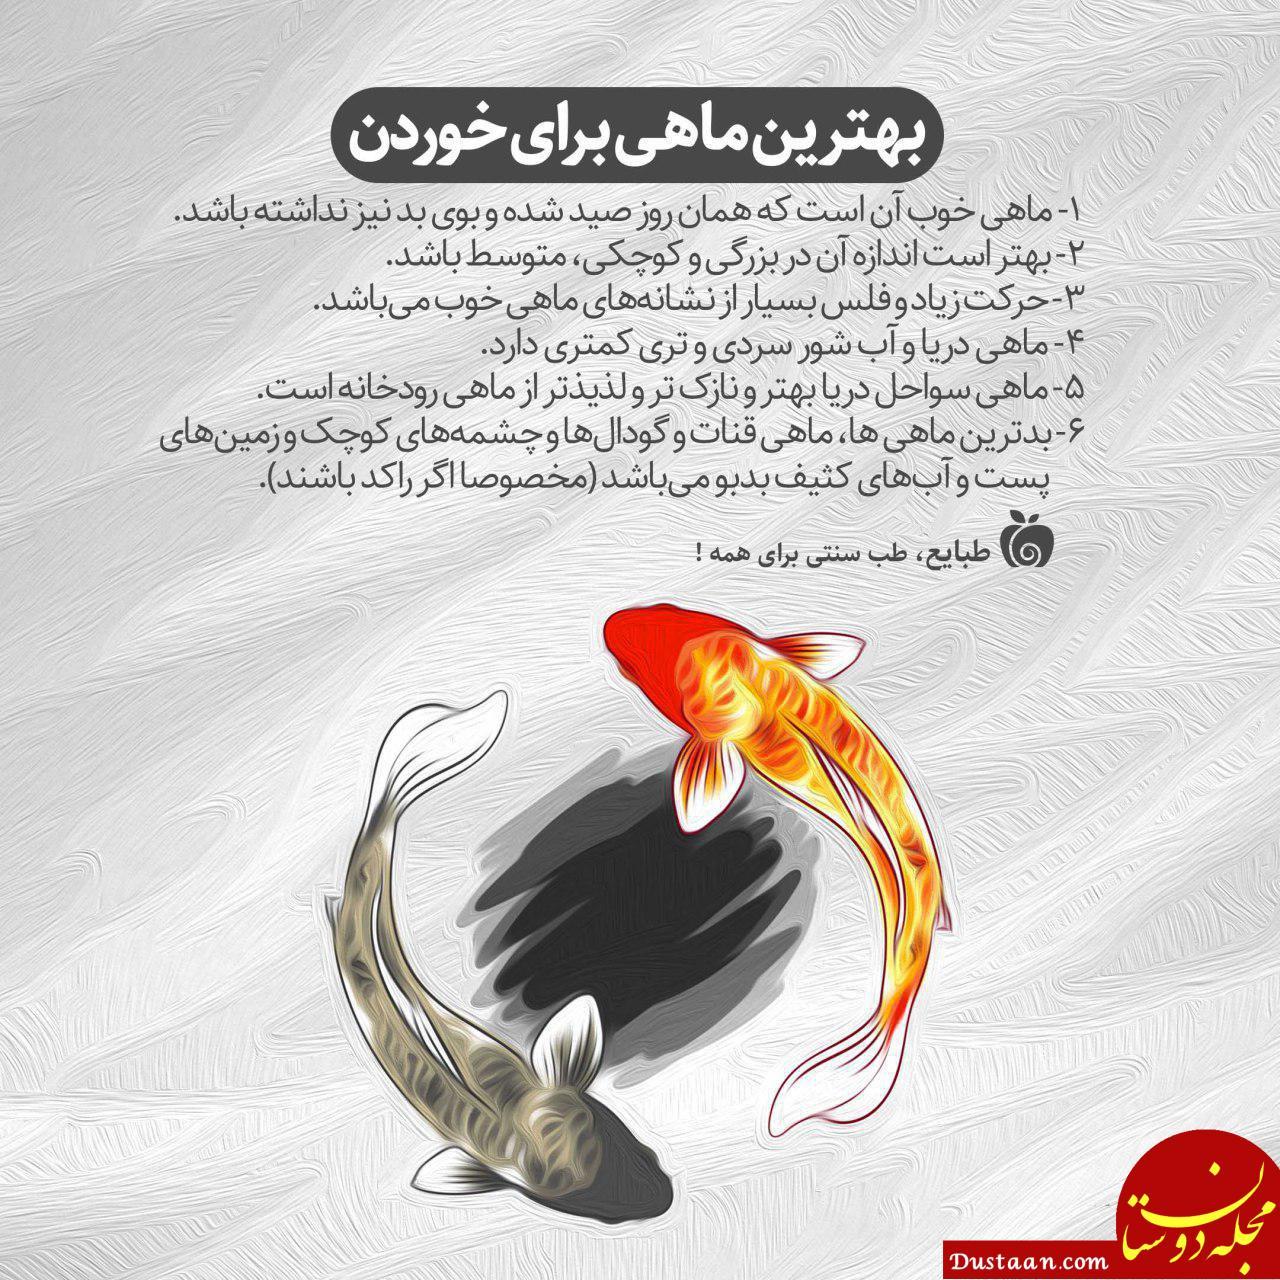 www.dustaan.com بهترین ماهی برای خوردن چه ویژگی هایی دارد؟